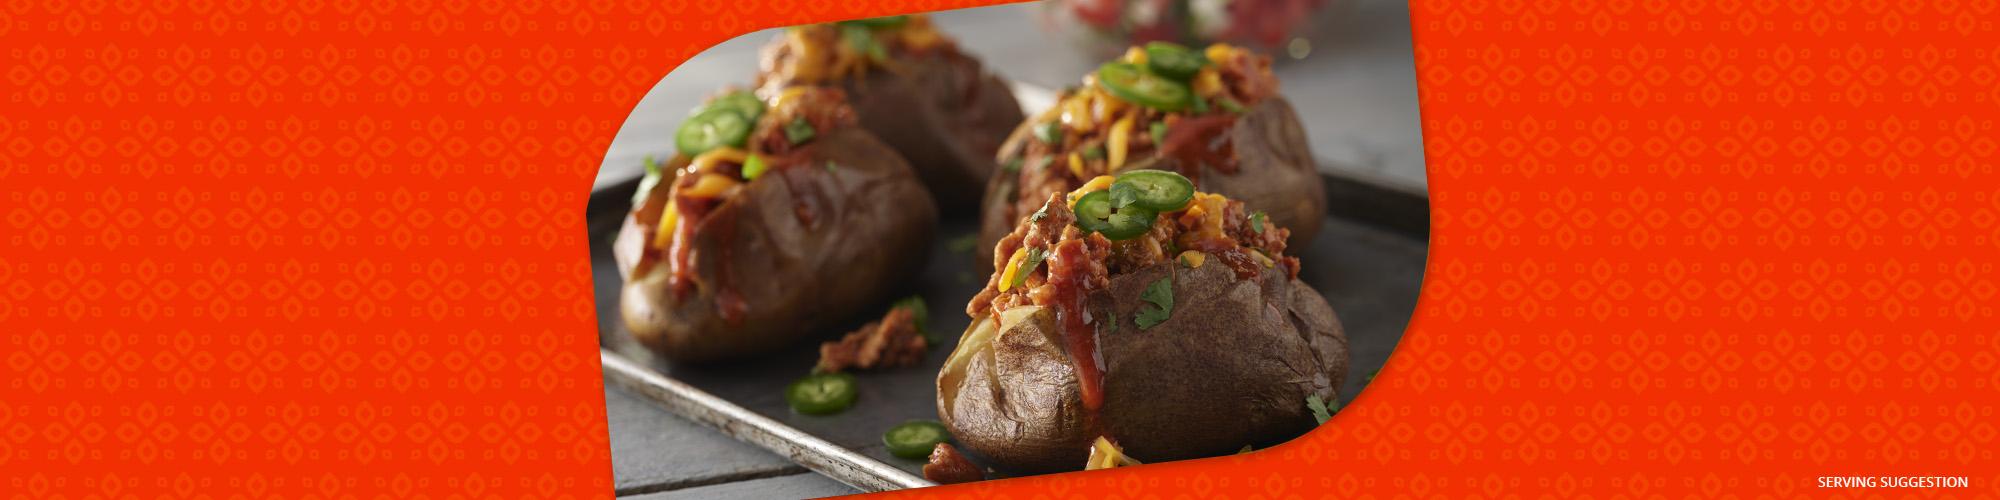 Salsas ground turkey enchilada stuffed baked potatoes